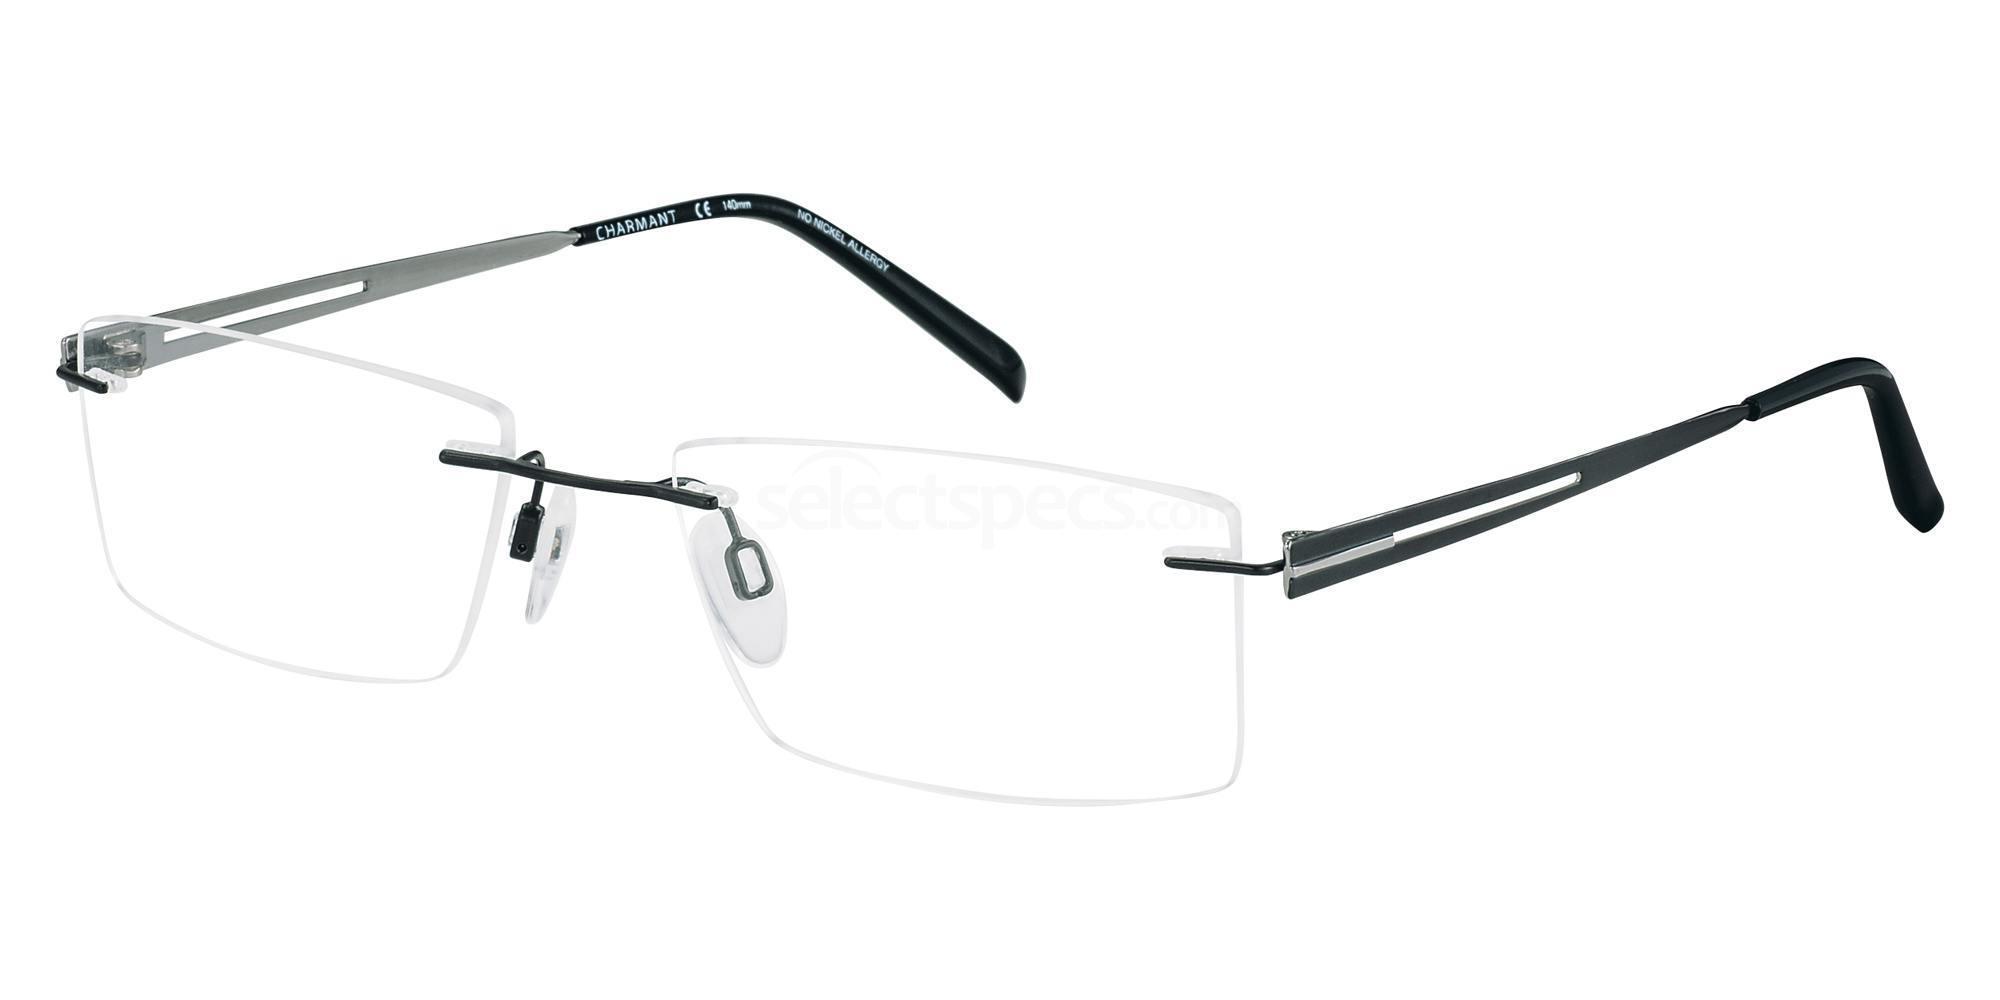 BK CH10965 Glasses, Charmant Titanium Perfection